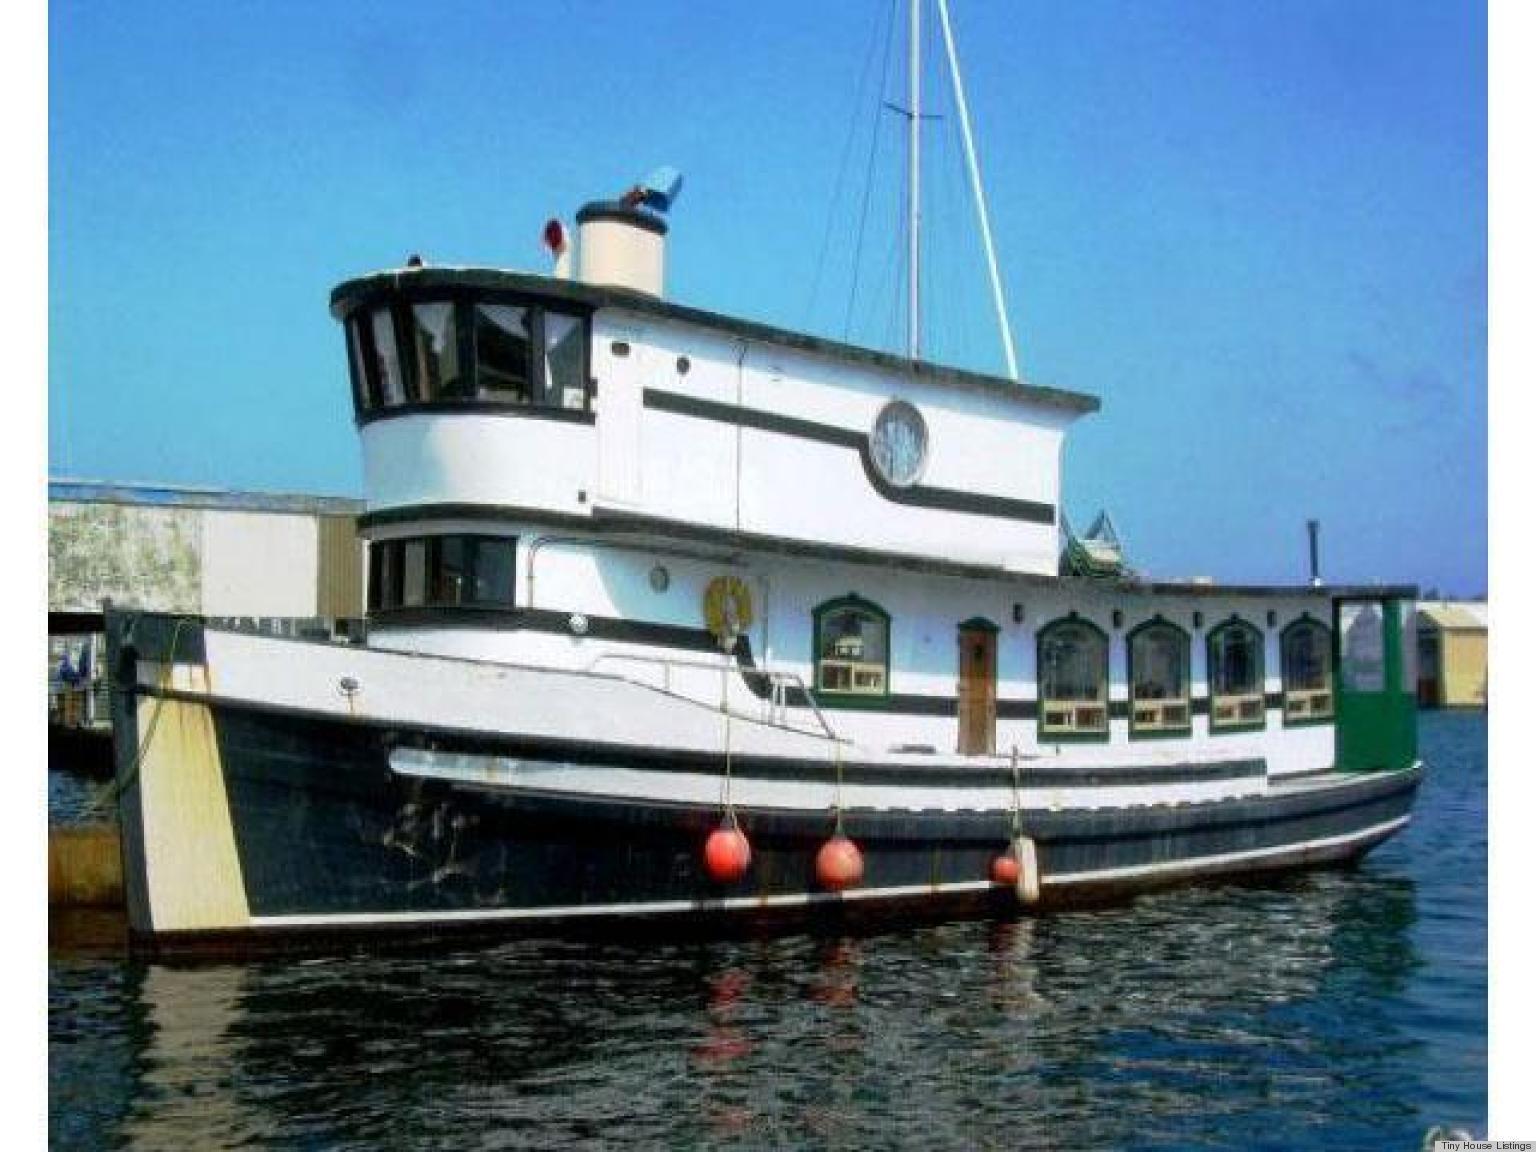 Pilot house trawler aka fishing boat converted into for Pilot house fishing boats